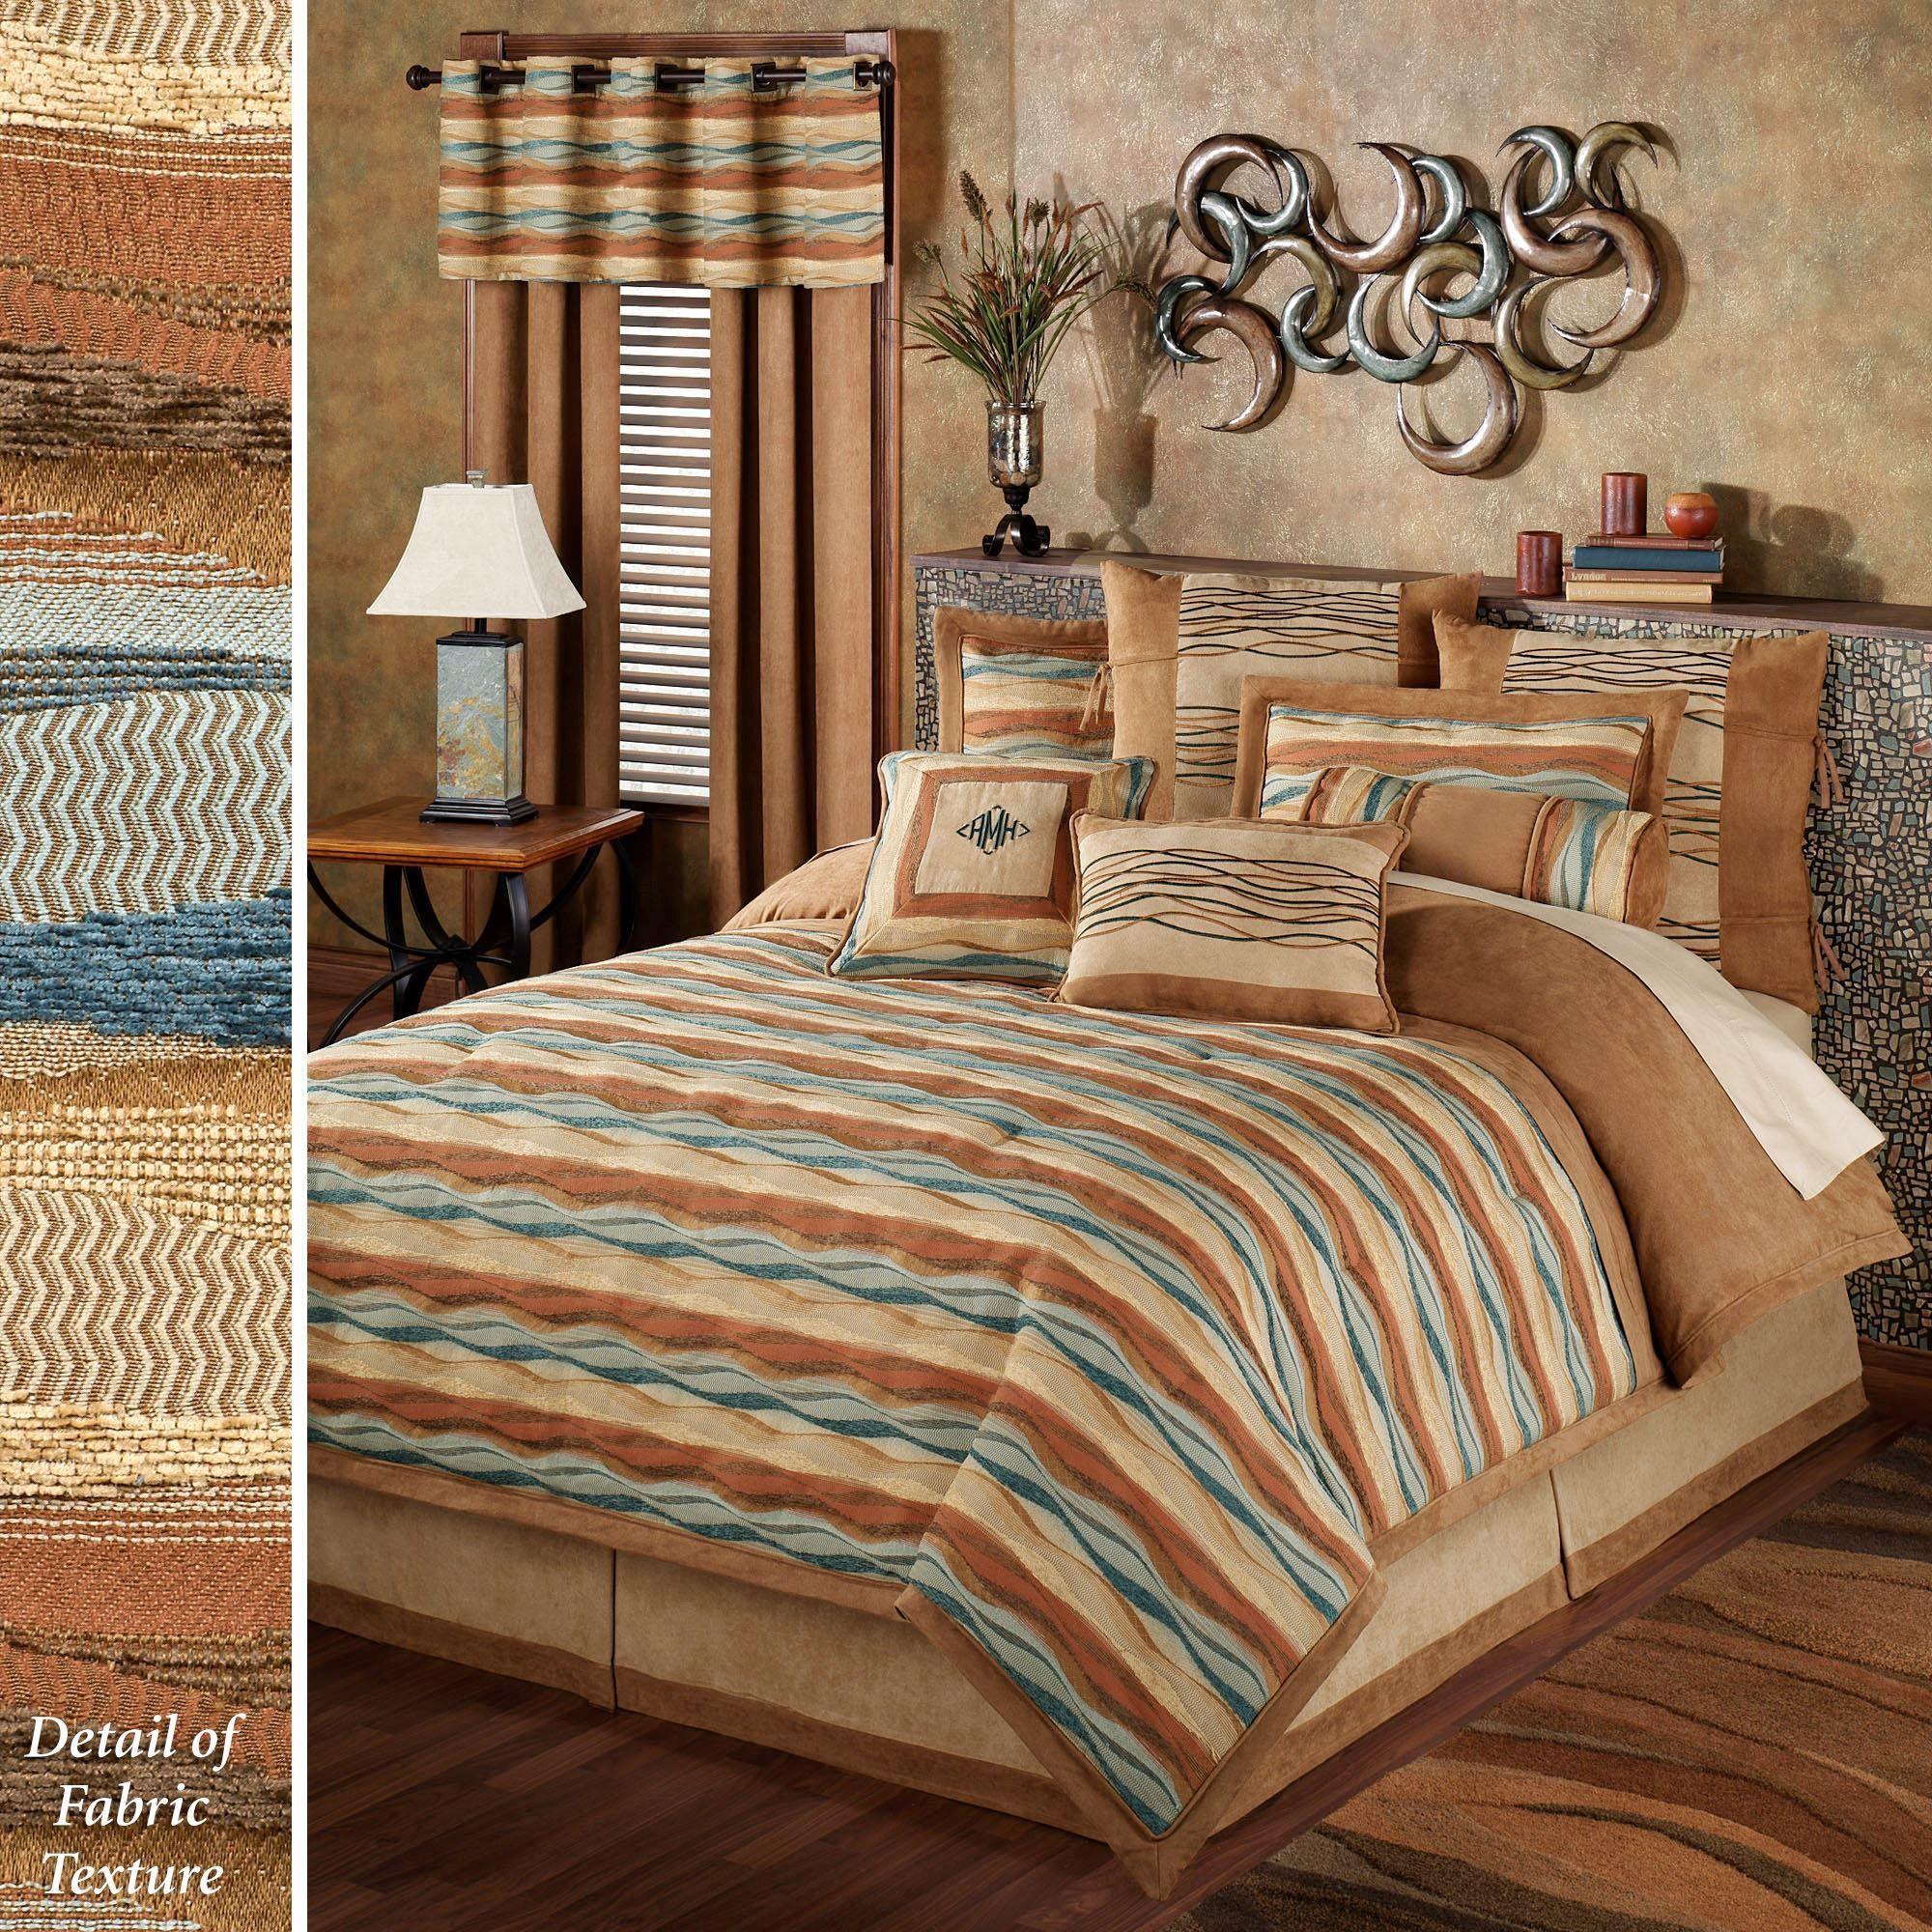 Oasis Wave Striped Comforter Bedding